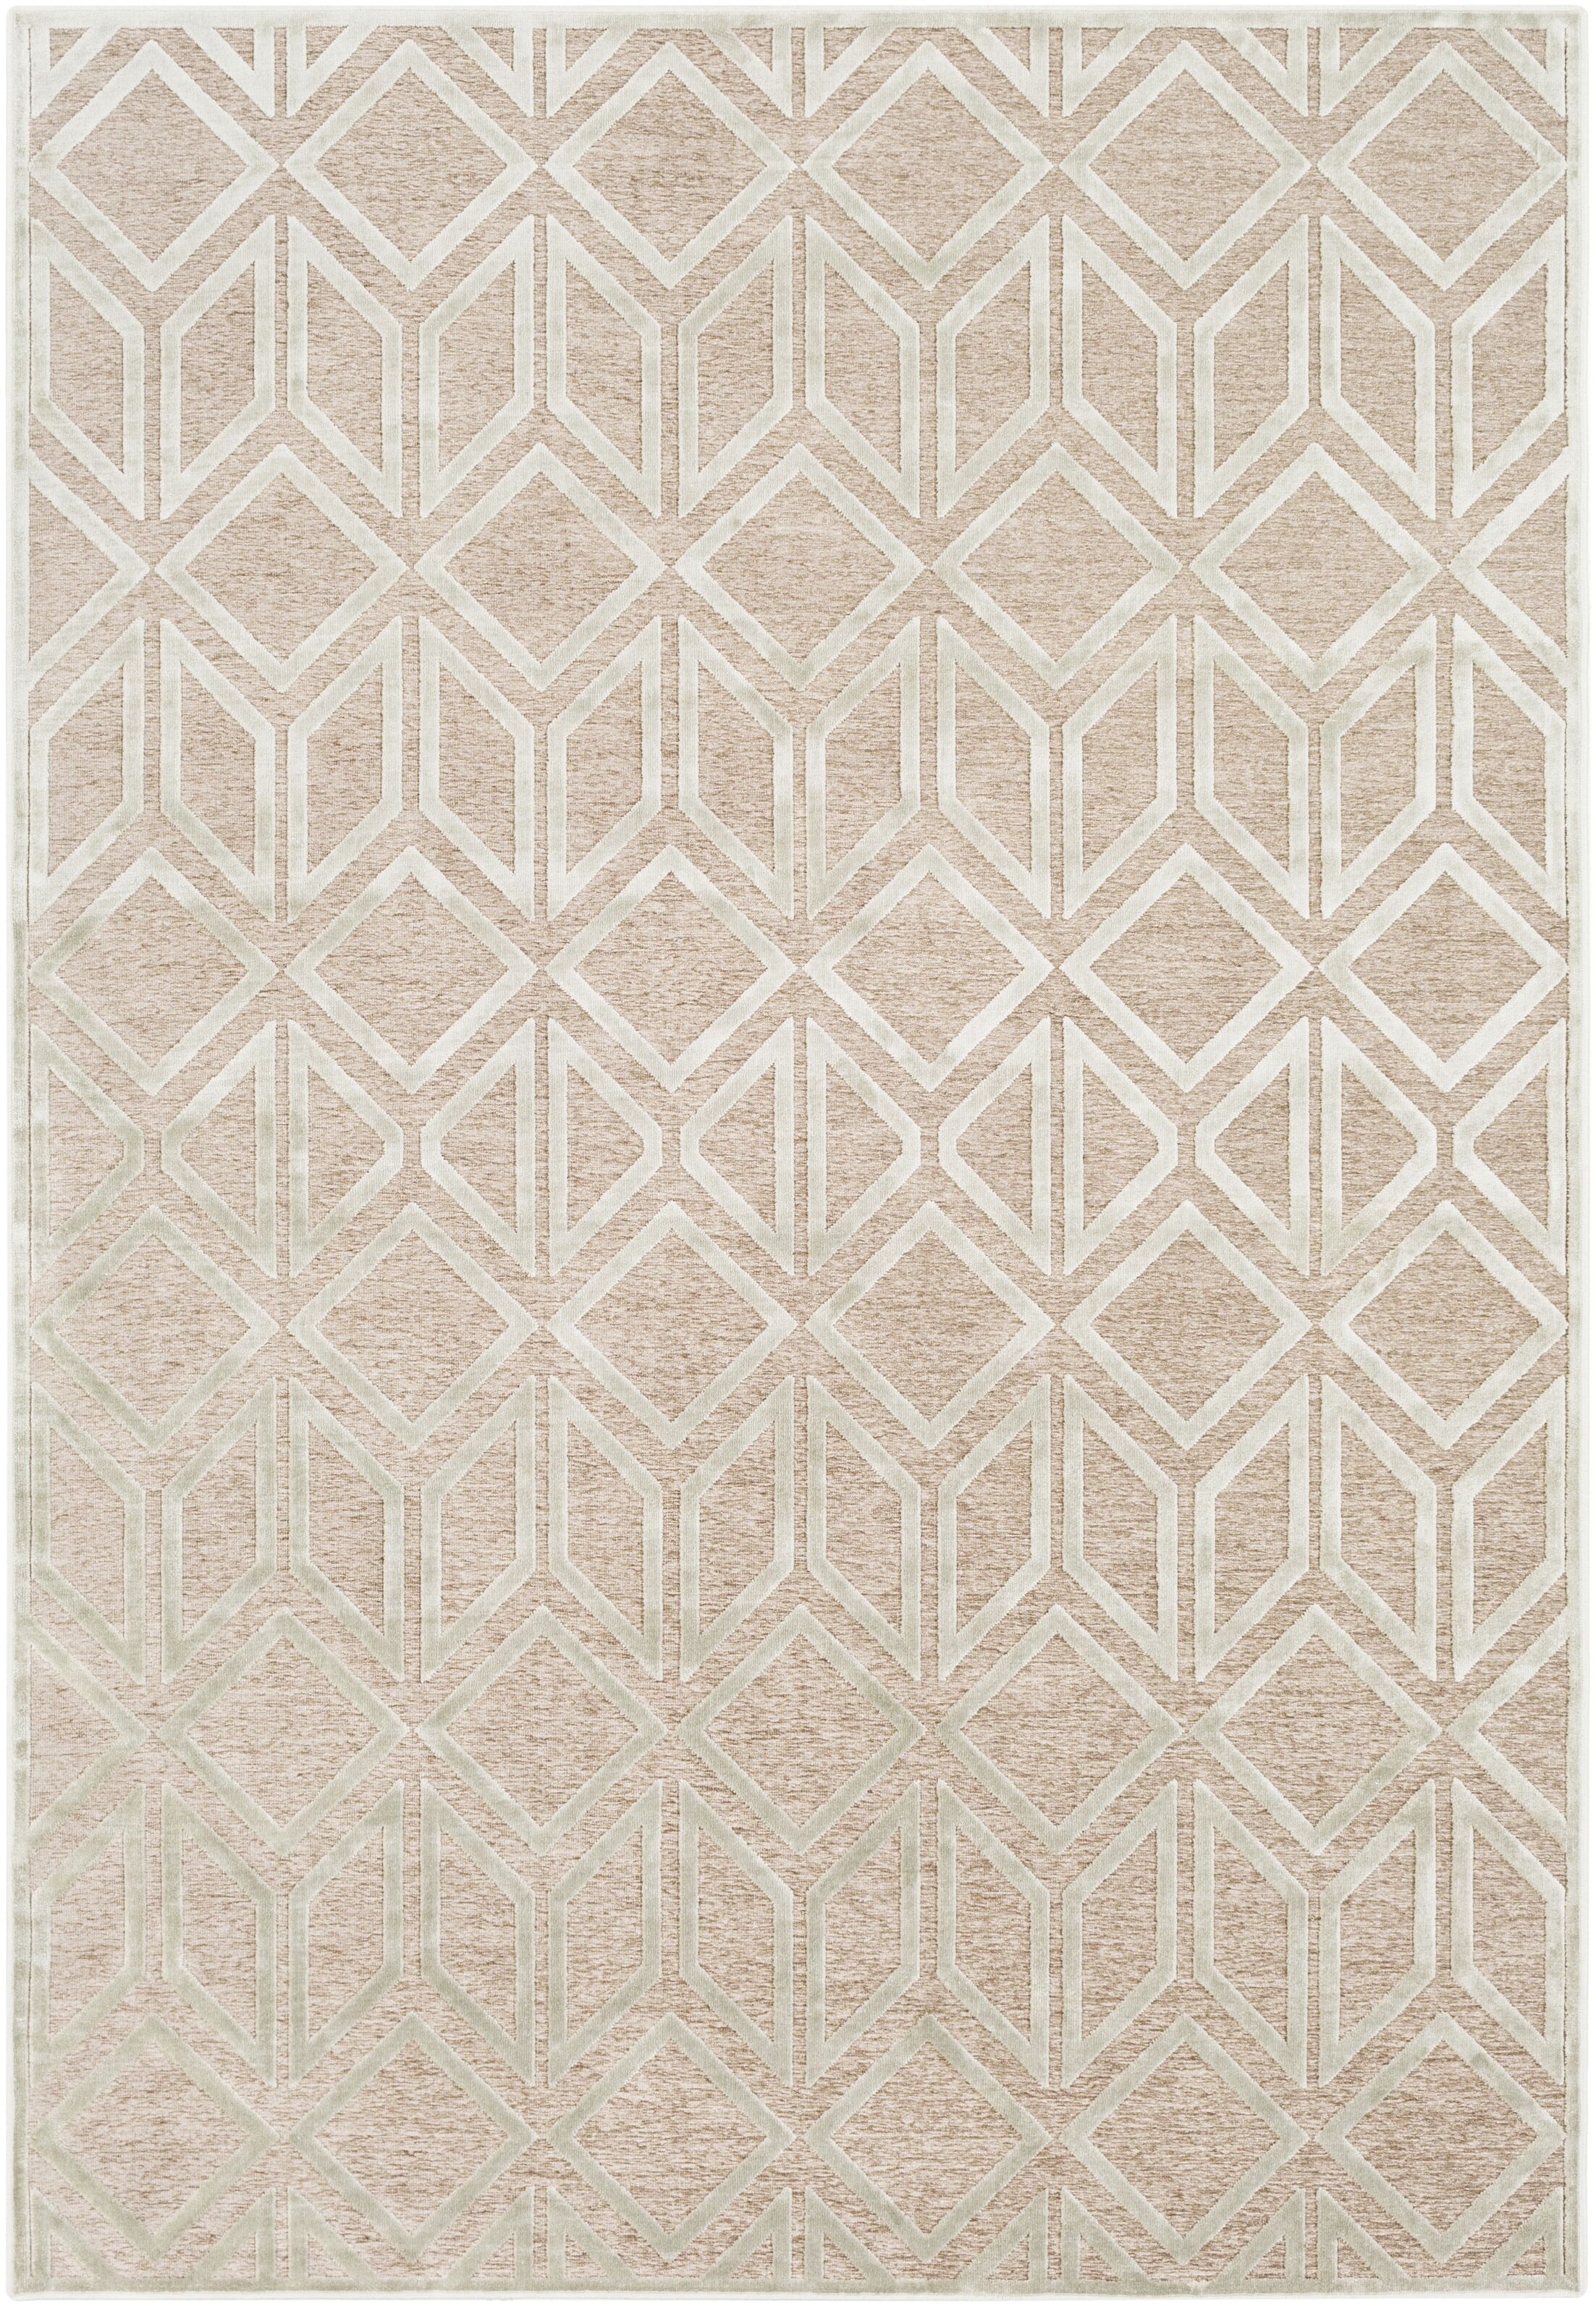 Lucius Modern Geometric Taupe/Seafoam Area Rug Rug Size: Rectangle 5'2